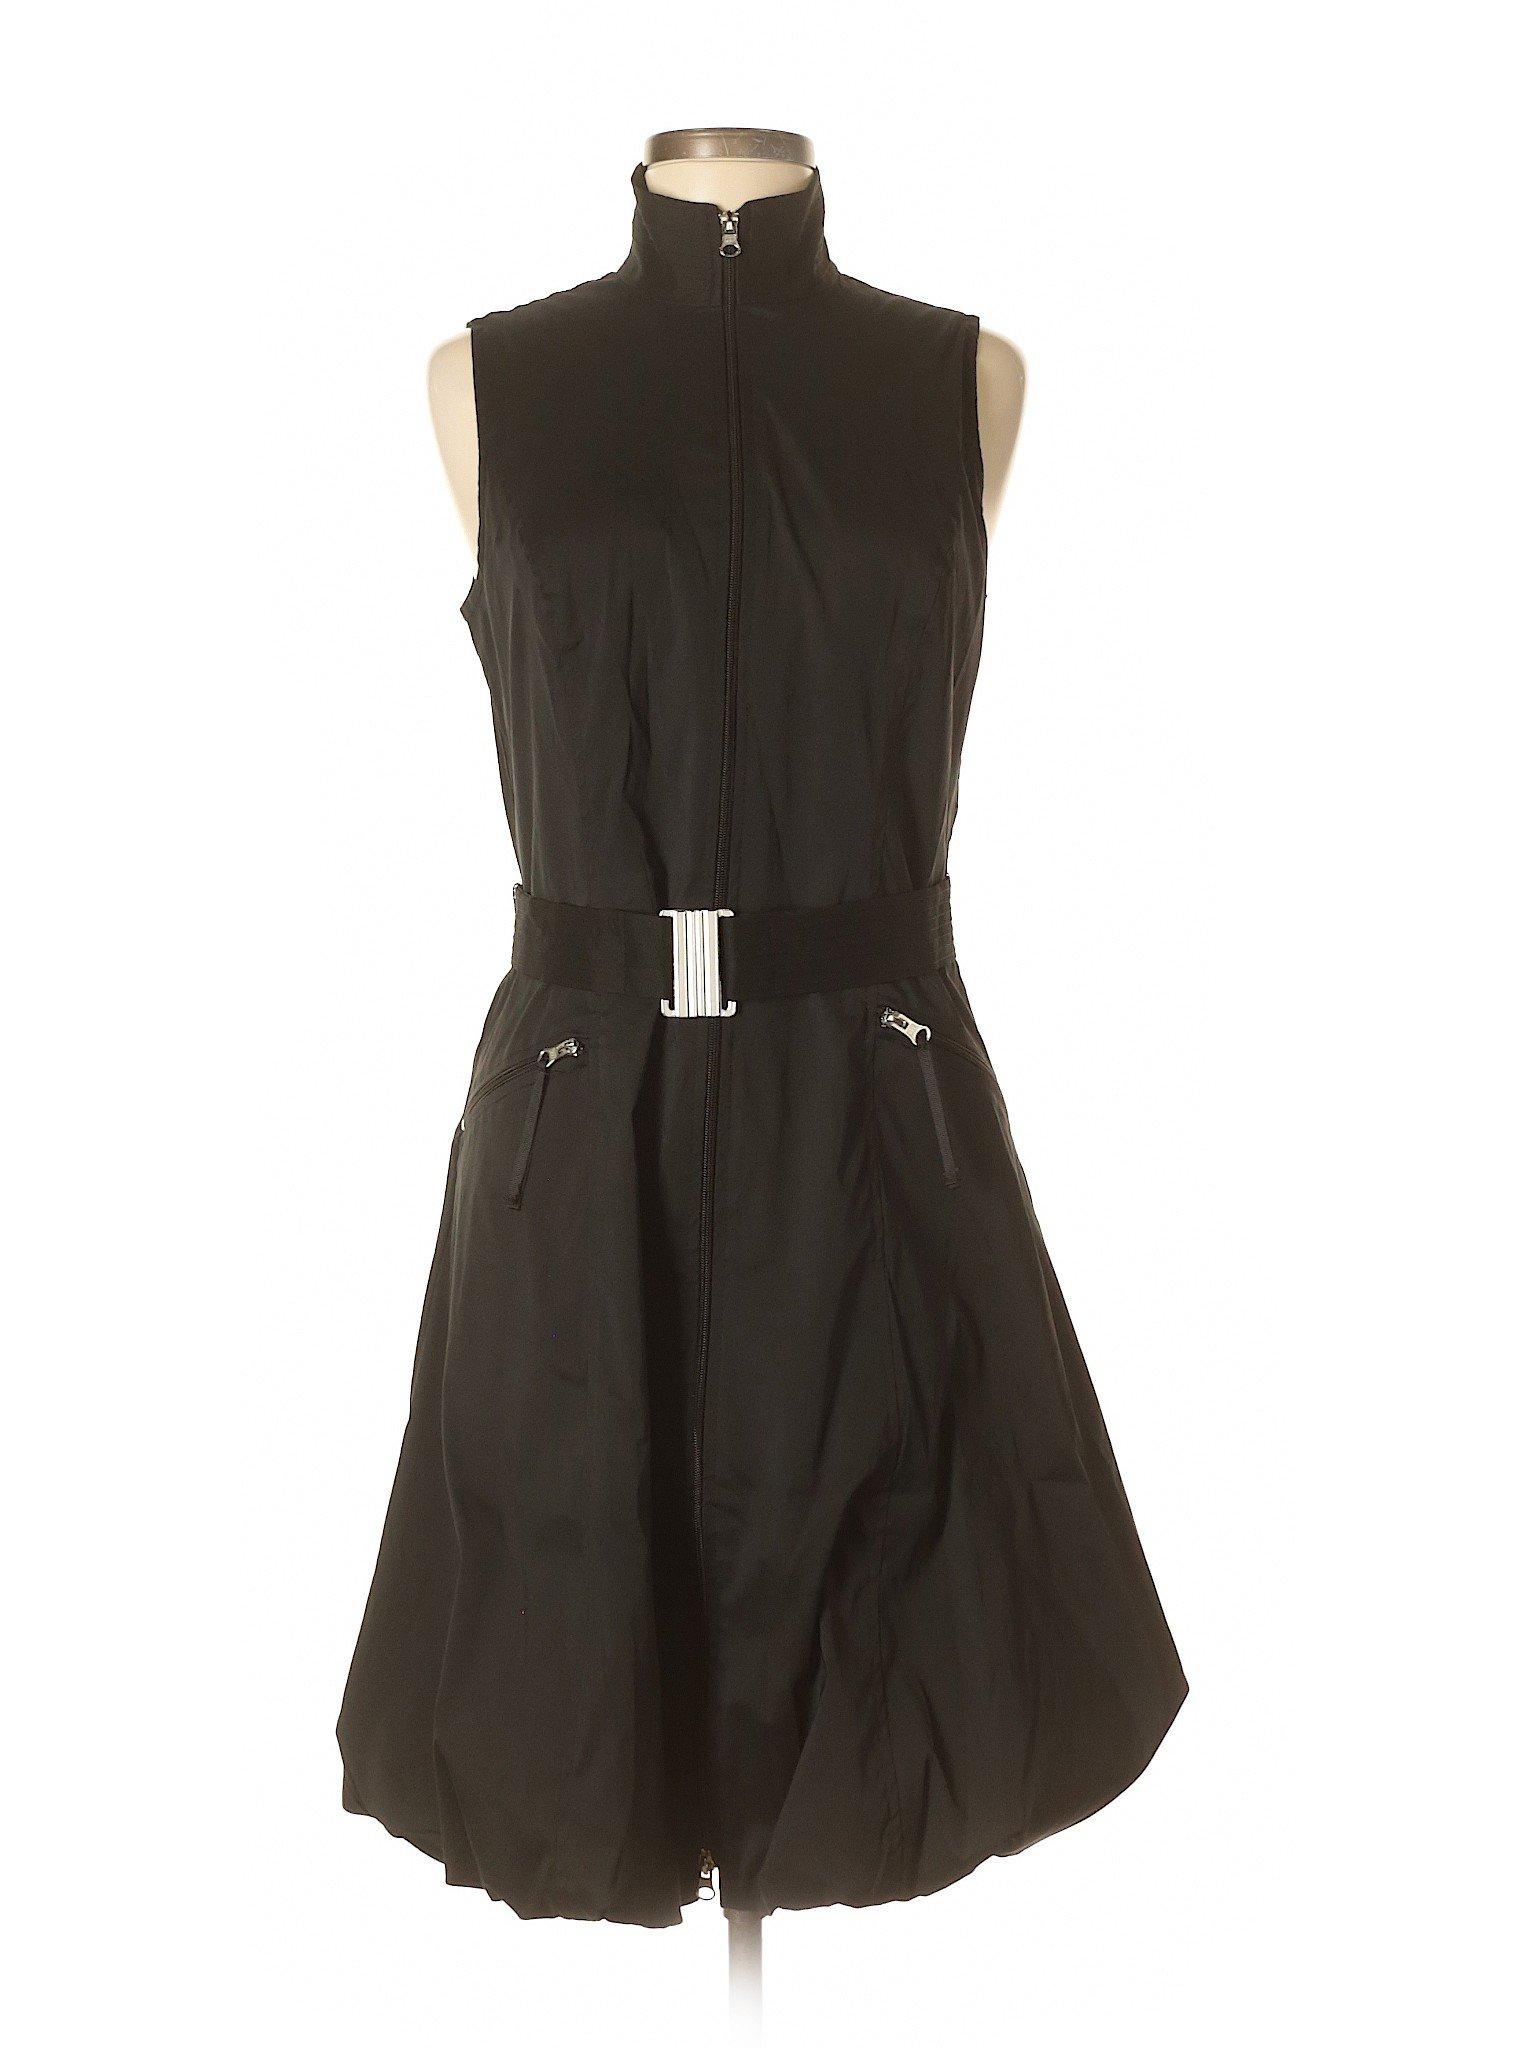 winter Ribkoff Dress Boutique Casual Joseph 4wqpg